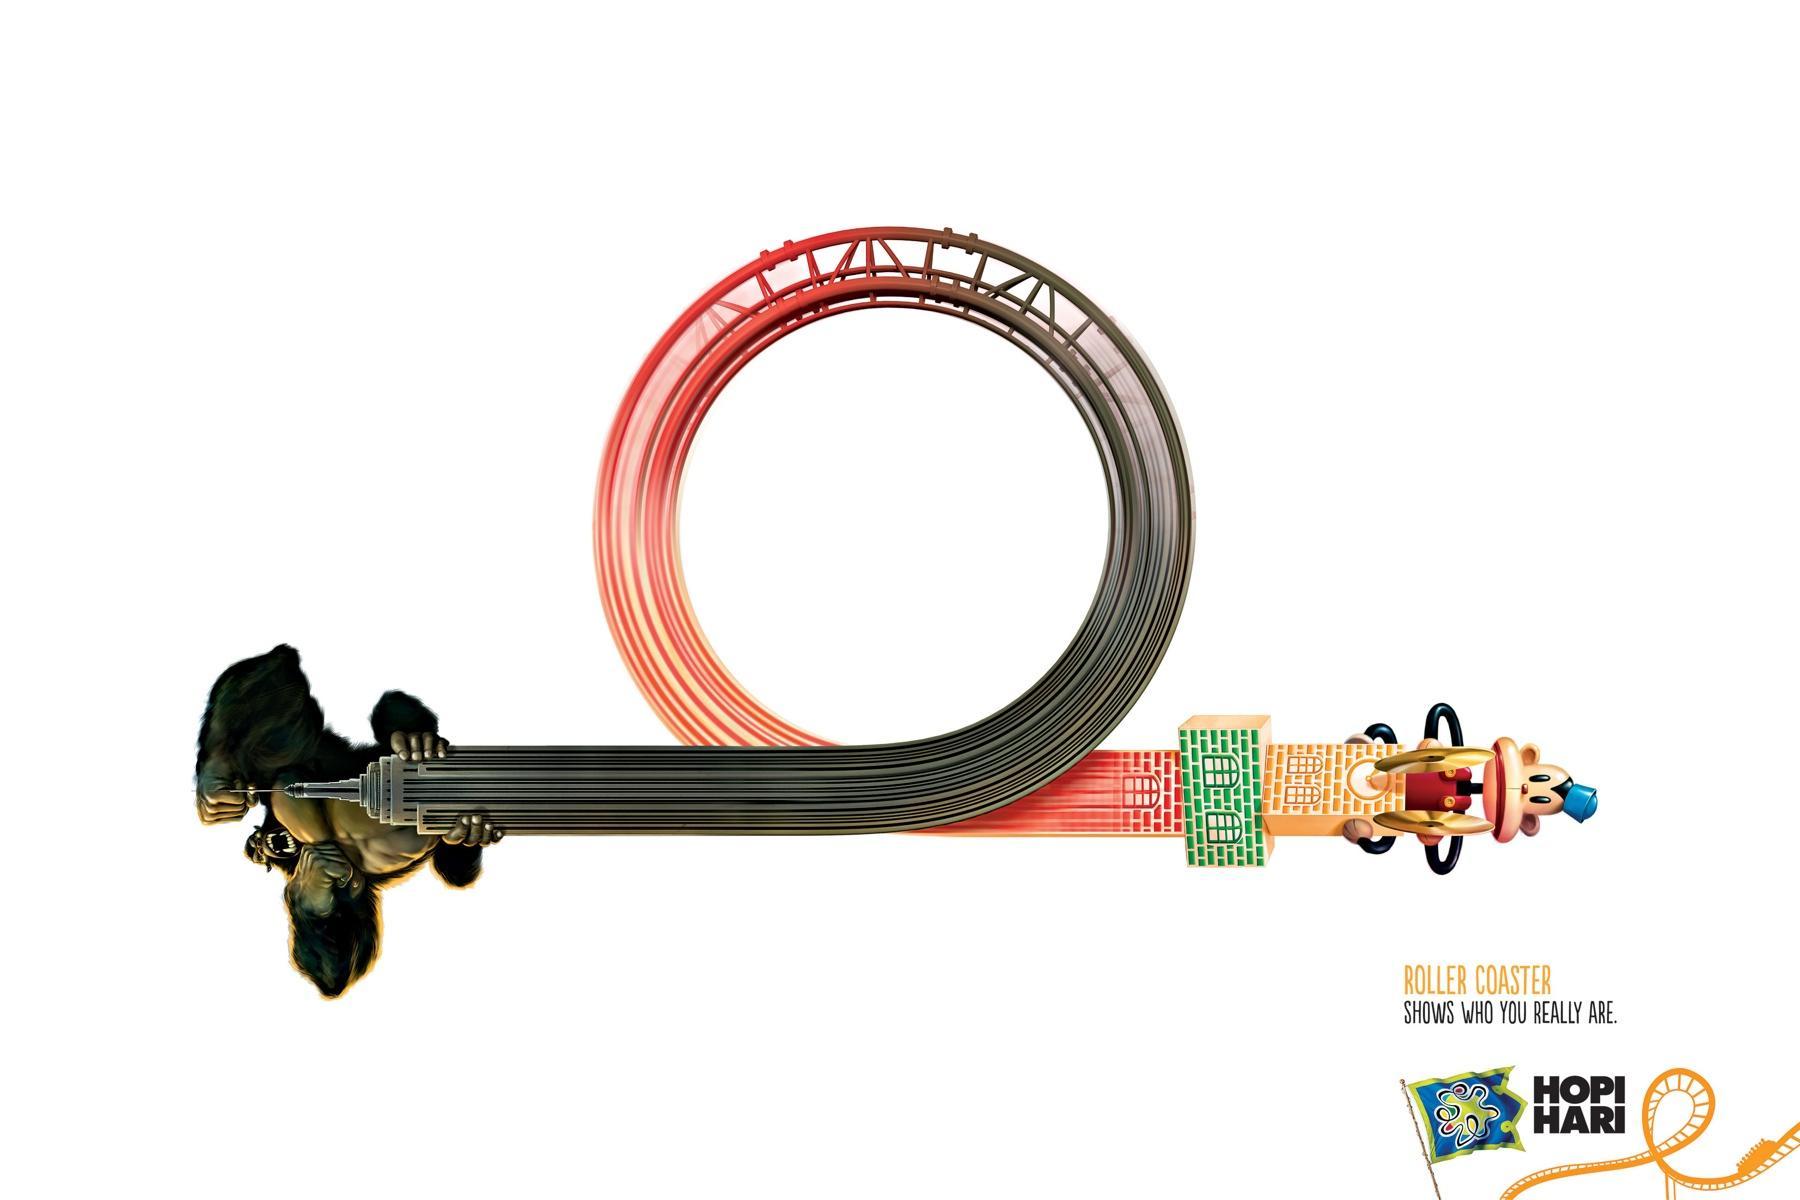 Hopi Hari Theme Park Print Ad -  Monkey